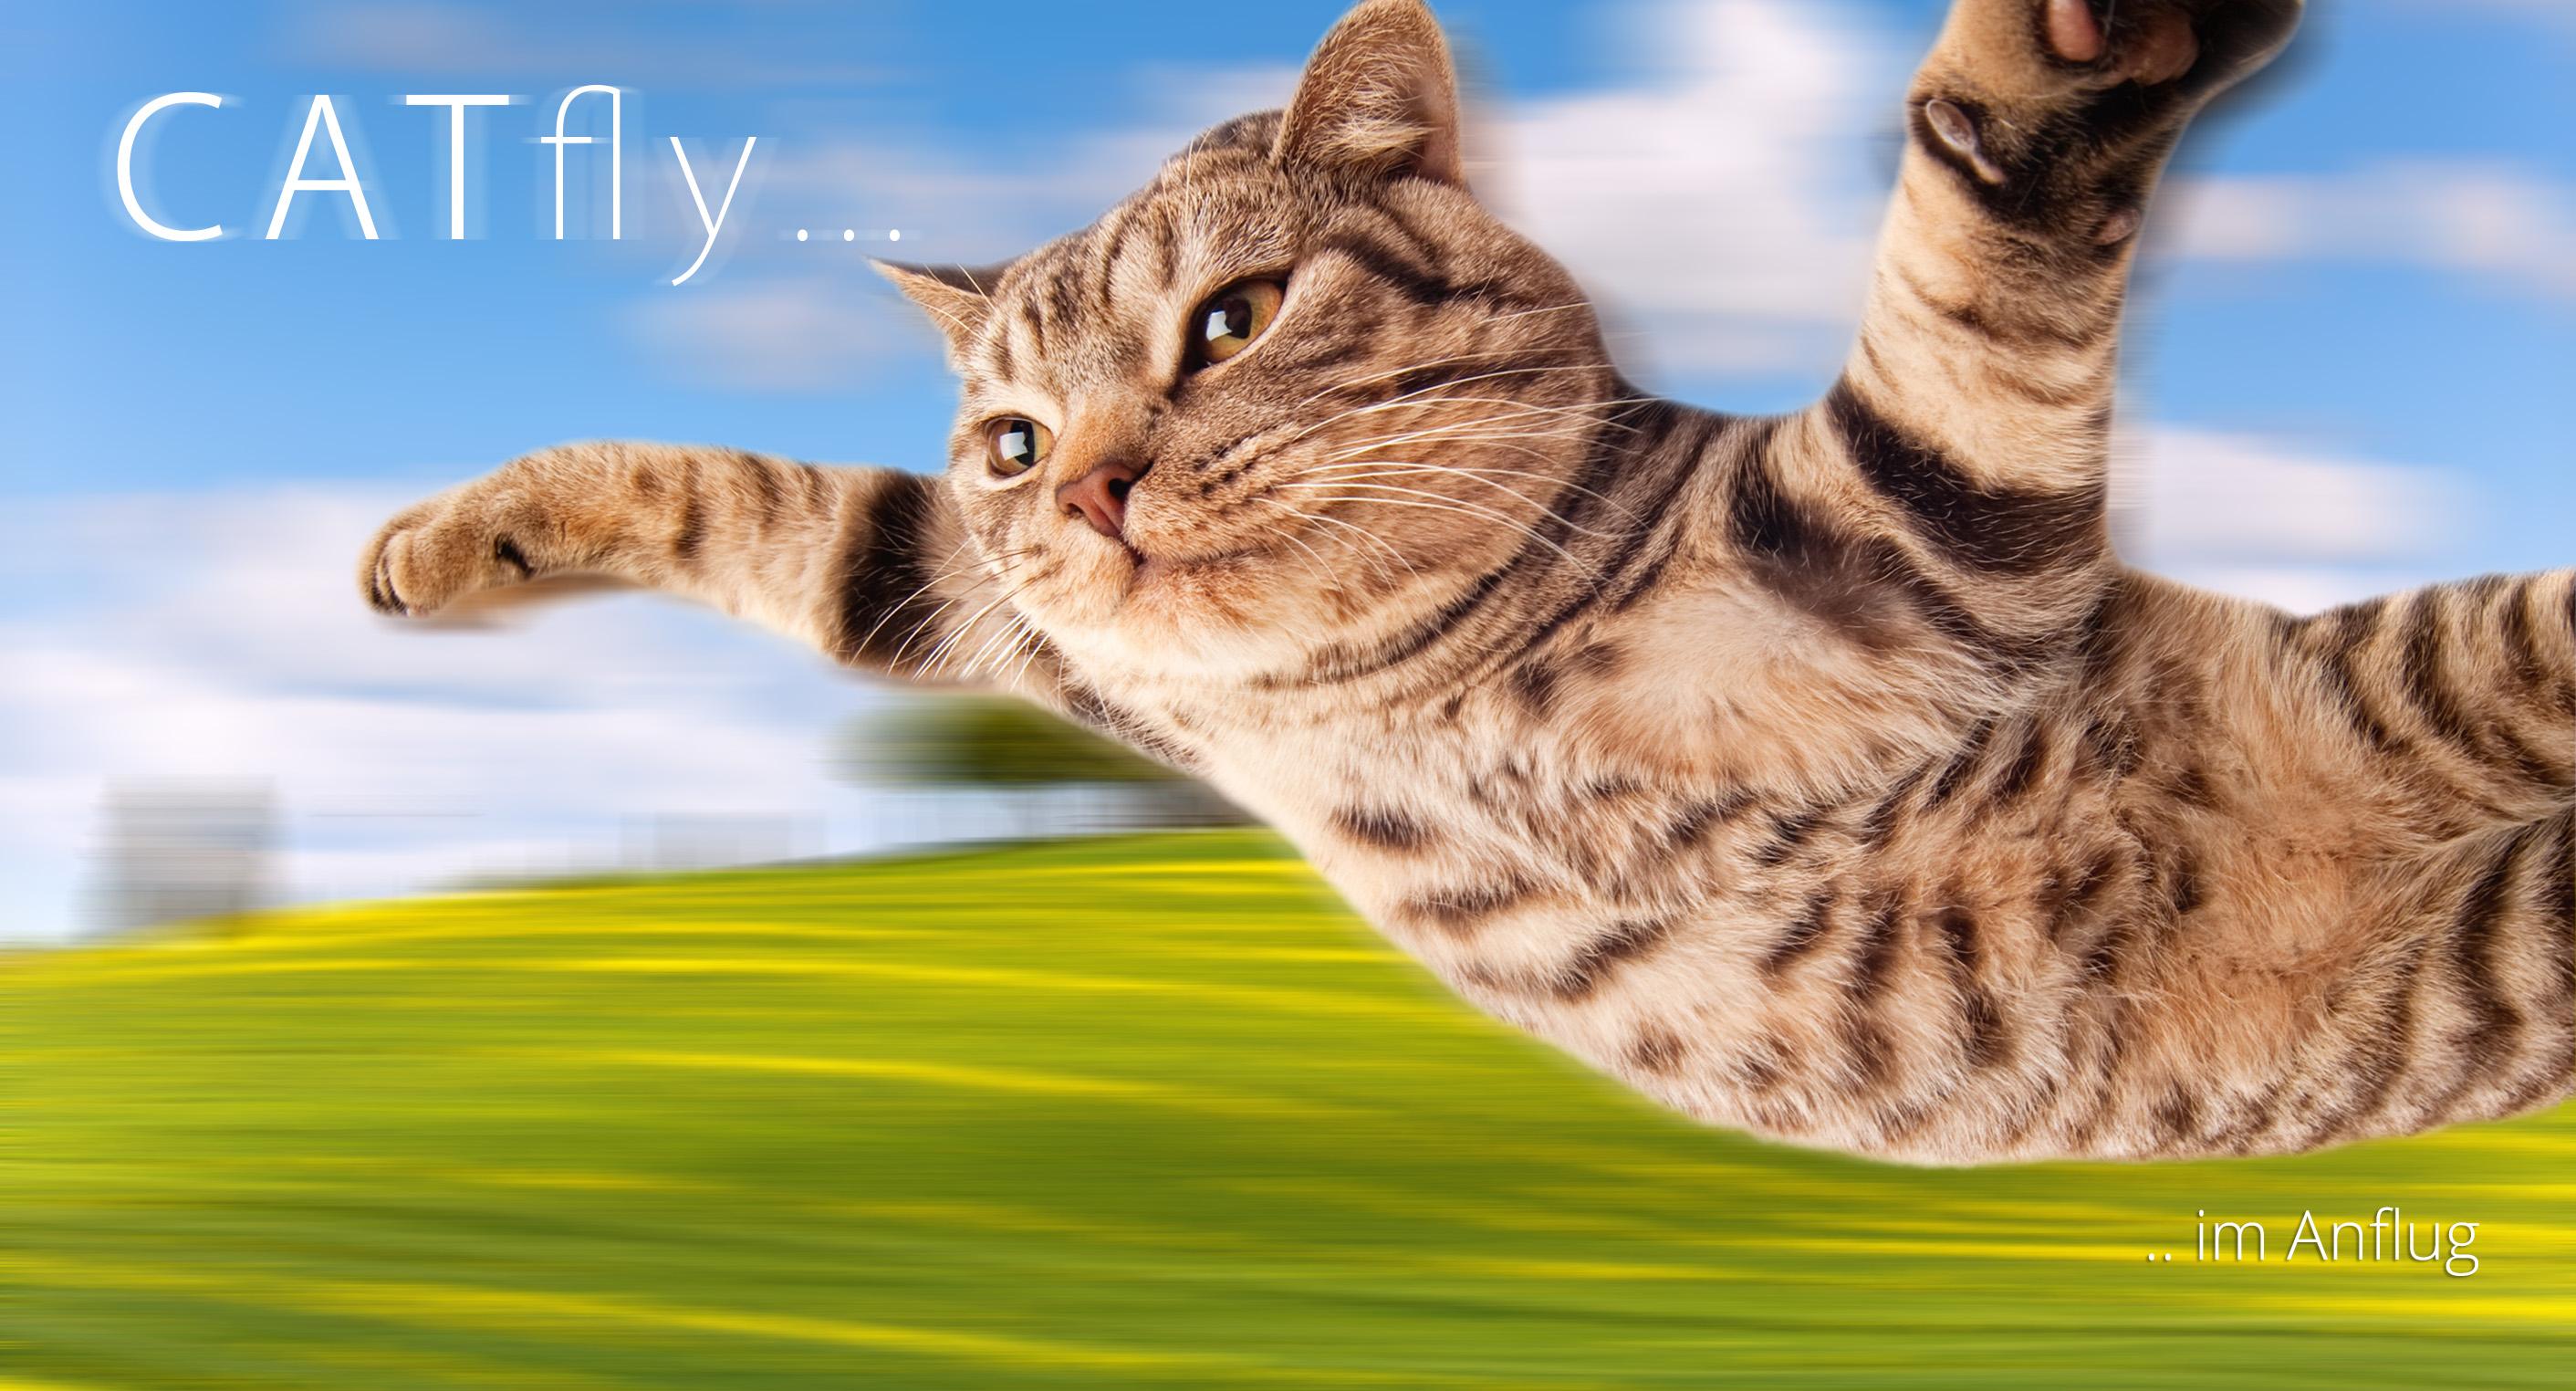 catfly-ad-version-1-11